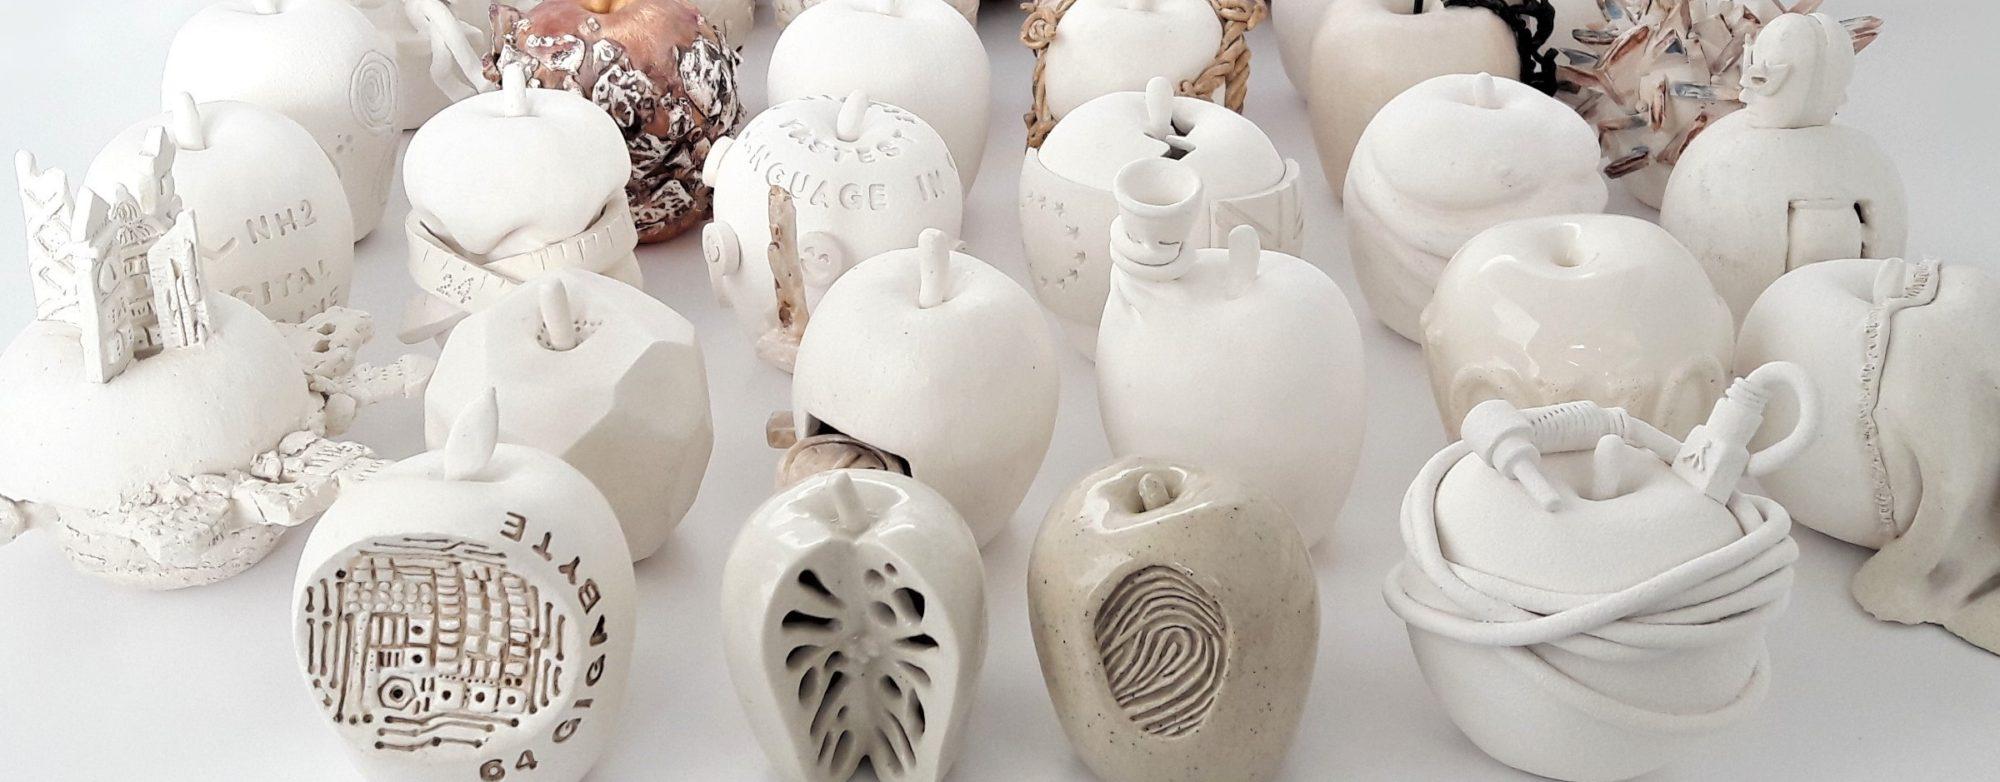 Original Contemporary Ceramic Sculpture Artwork